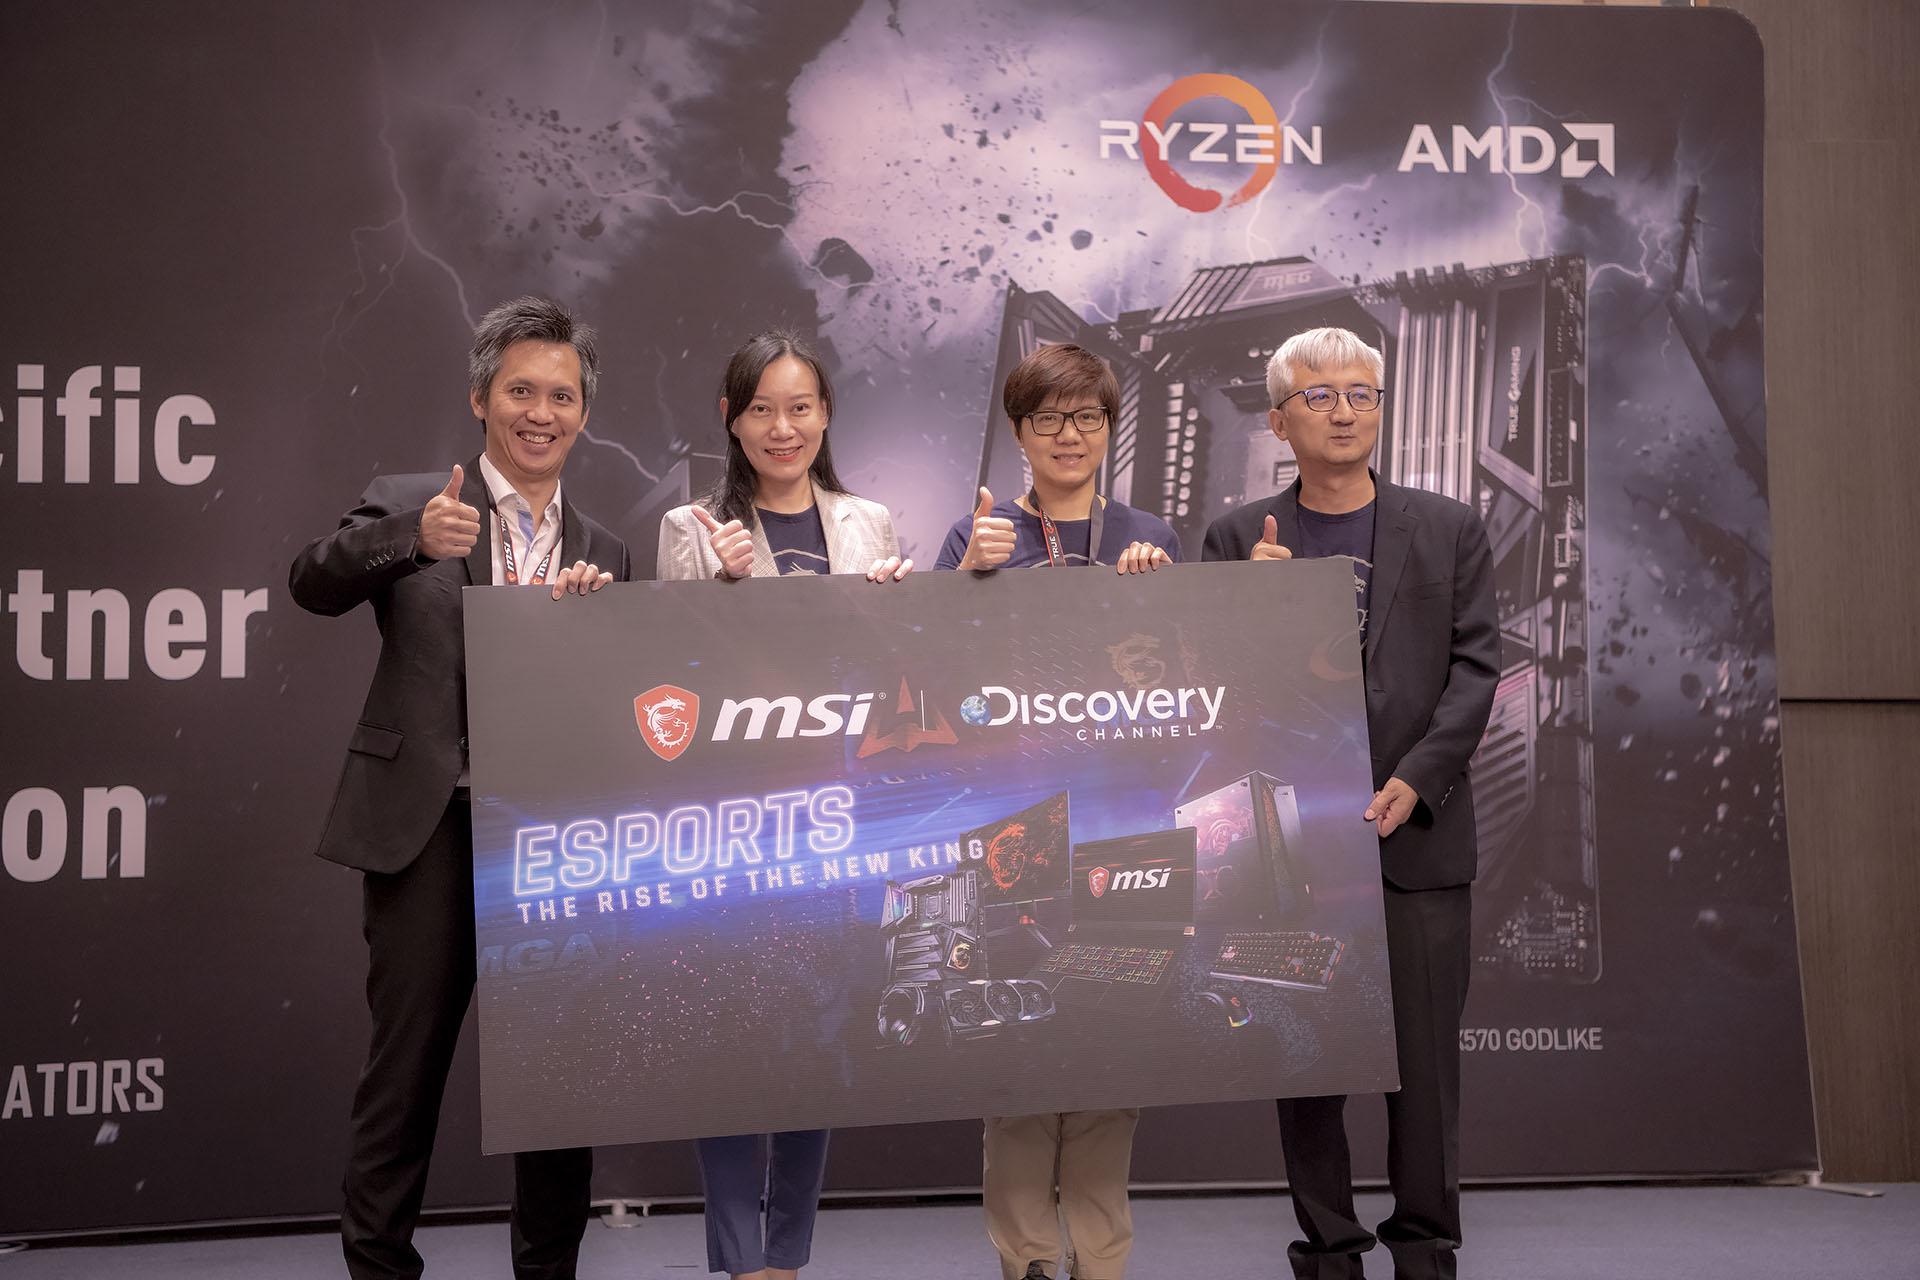 dsc 4958 บรรยากาศงาน MSI Indo Pacific X570 Partner Convention พบการเปิดตัวเมนบอร์ด X570 รุ่นใหม่ล่าสุดจากทาง MSI ต้อนรับการมาของซีพียู AMD RYZEN 3000ซีรี่ย์